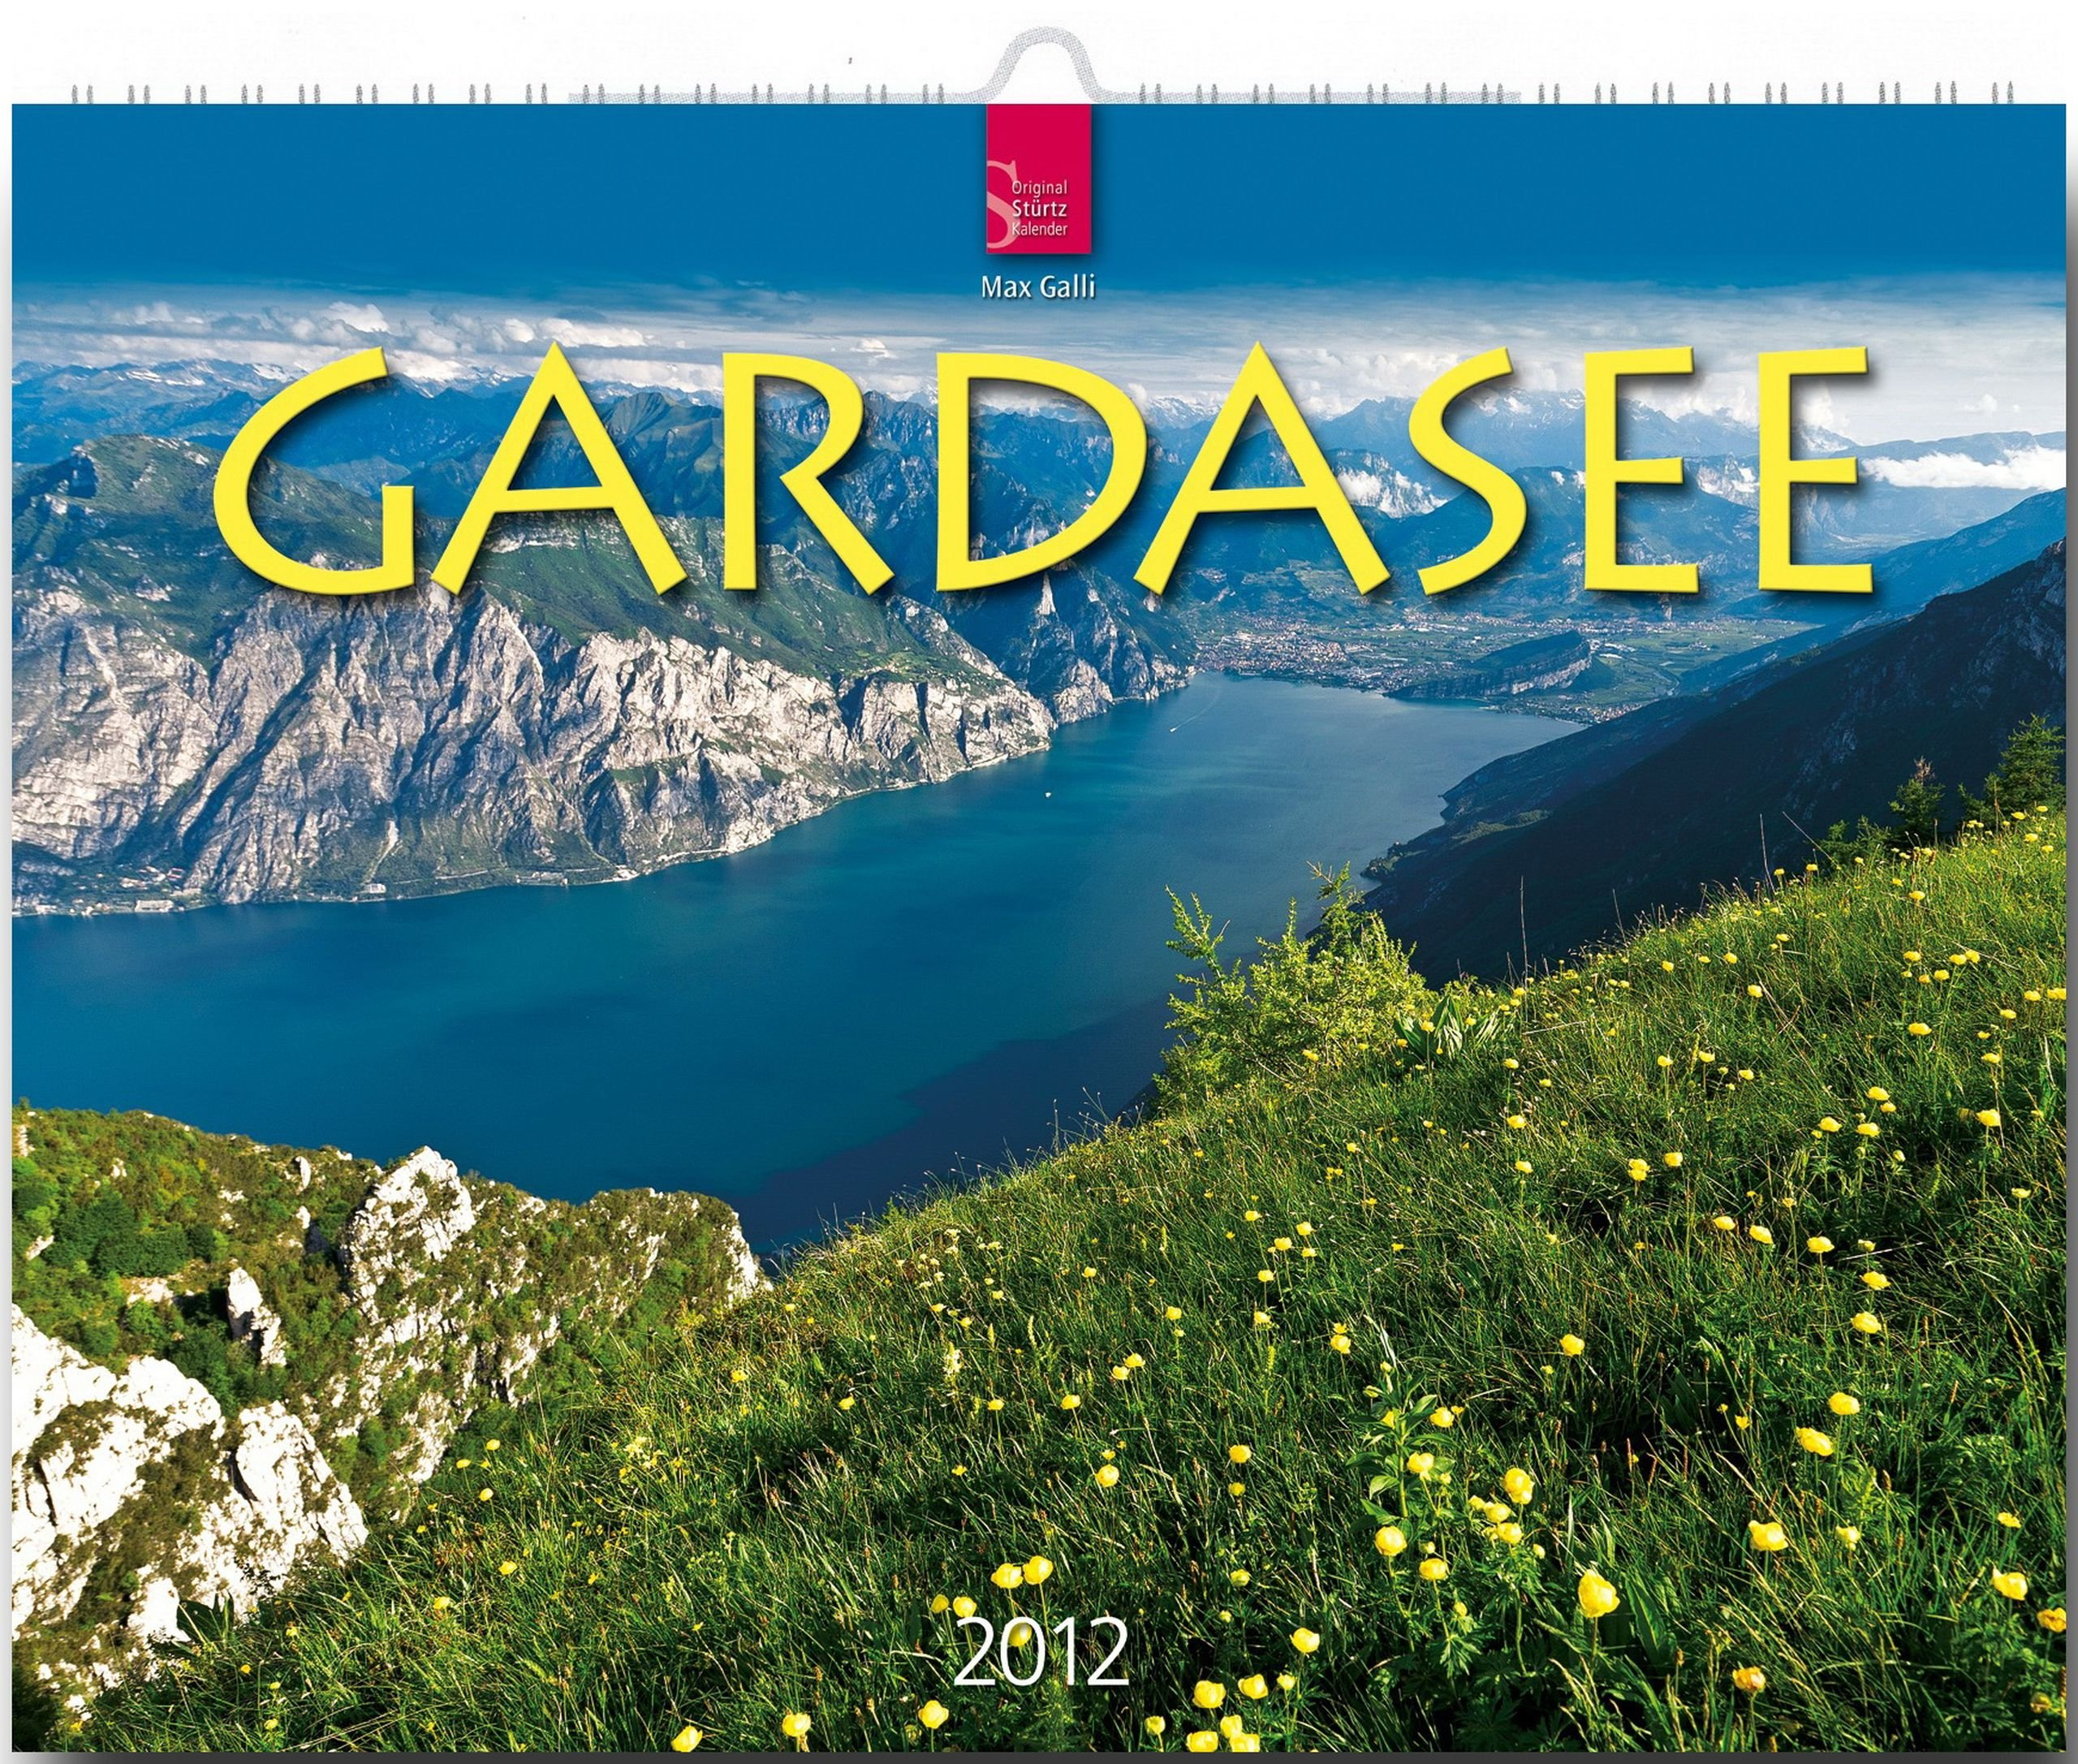 Gardasee 2012